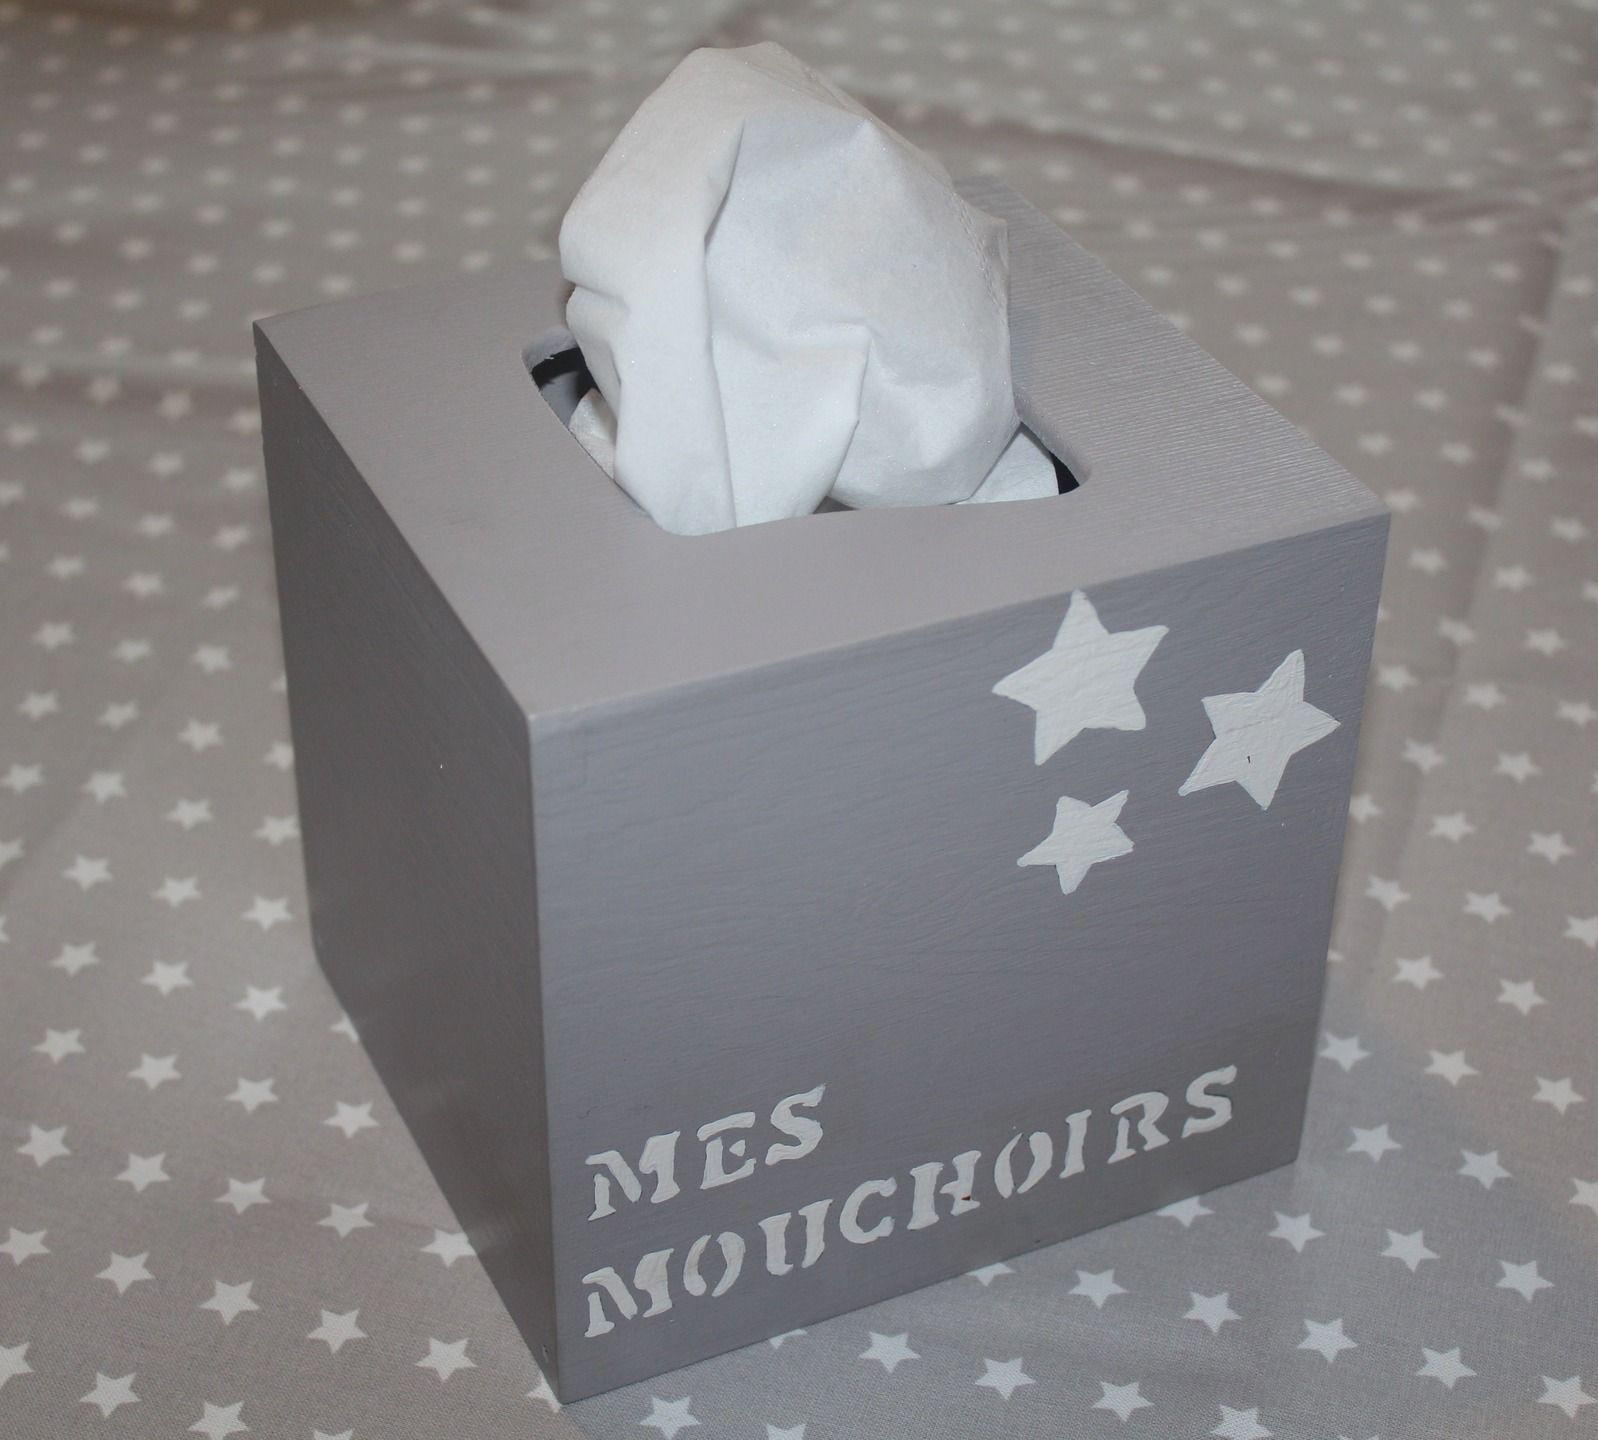 Boite mouchoirs carr e mes mouchoirs d coration - Deco boite a mouchoir ...